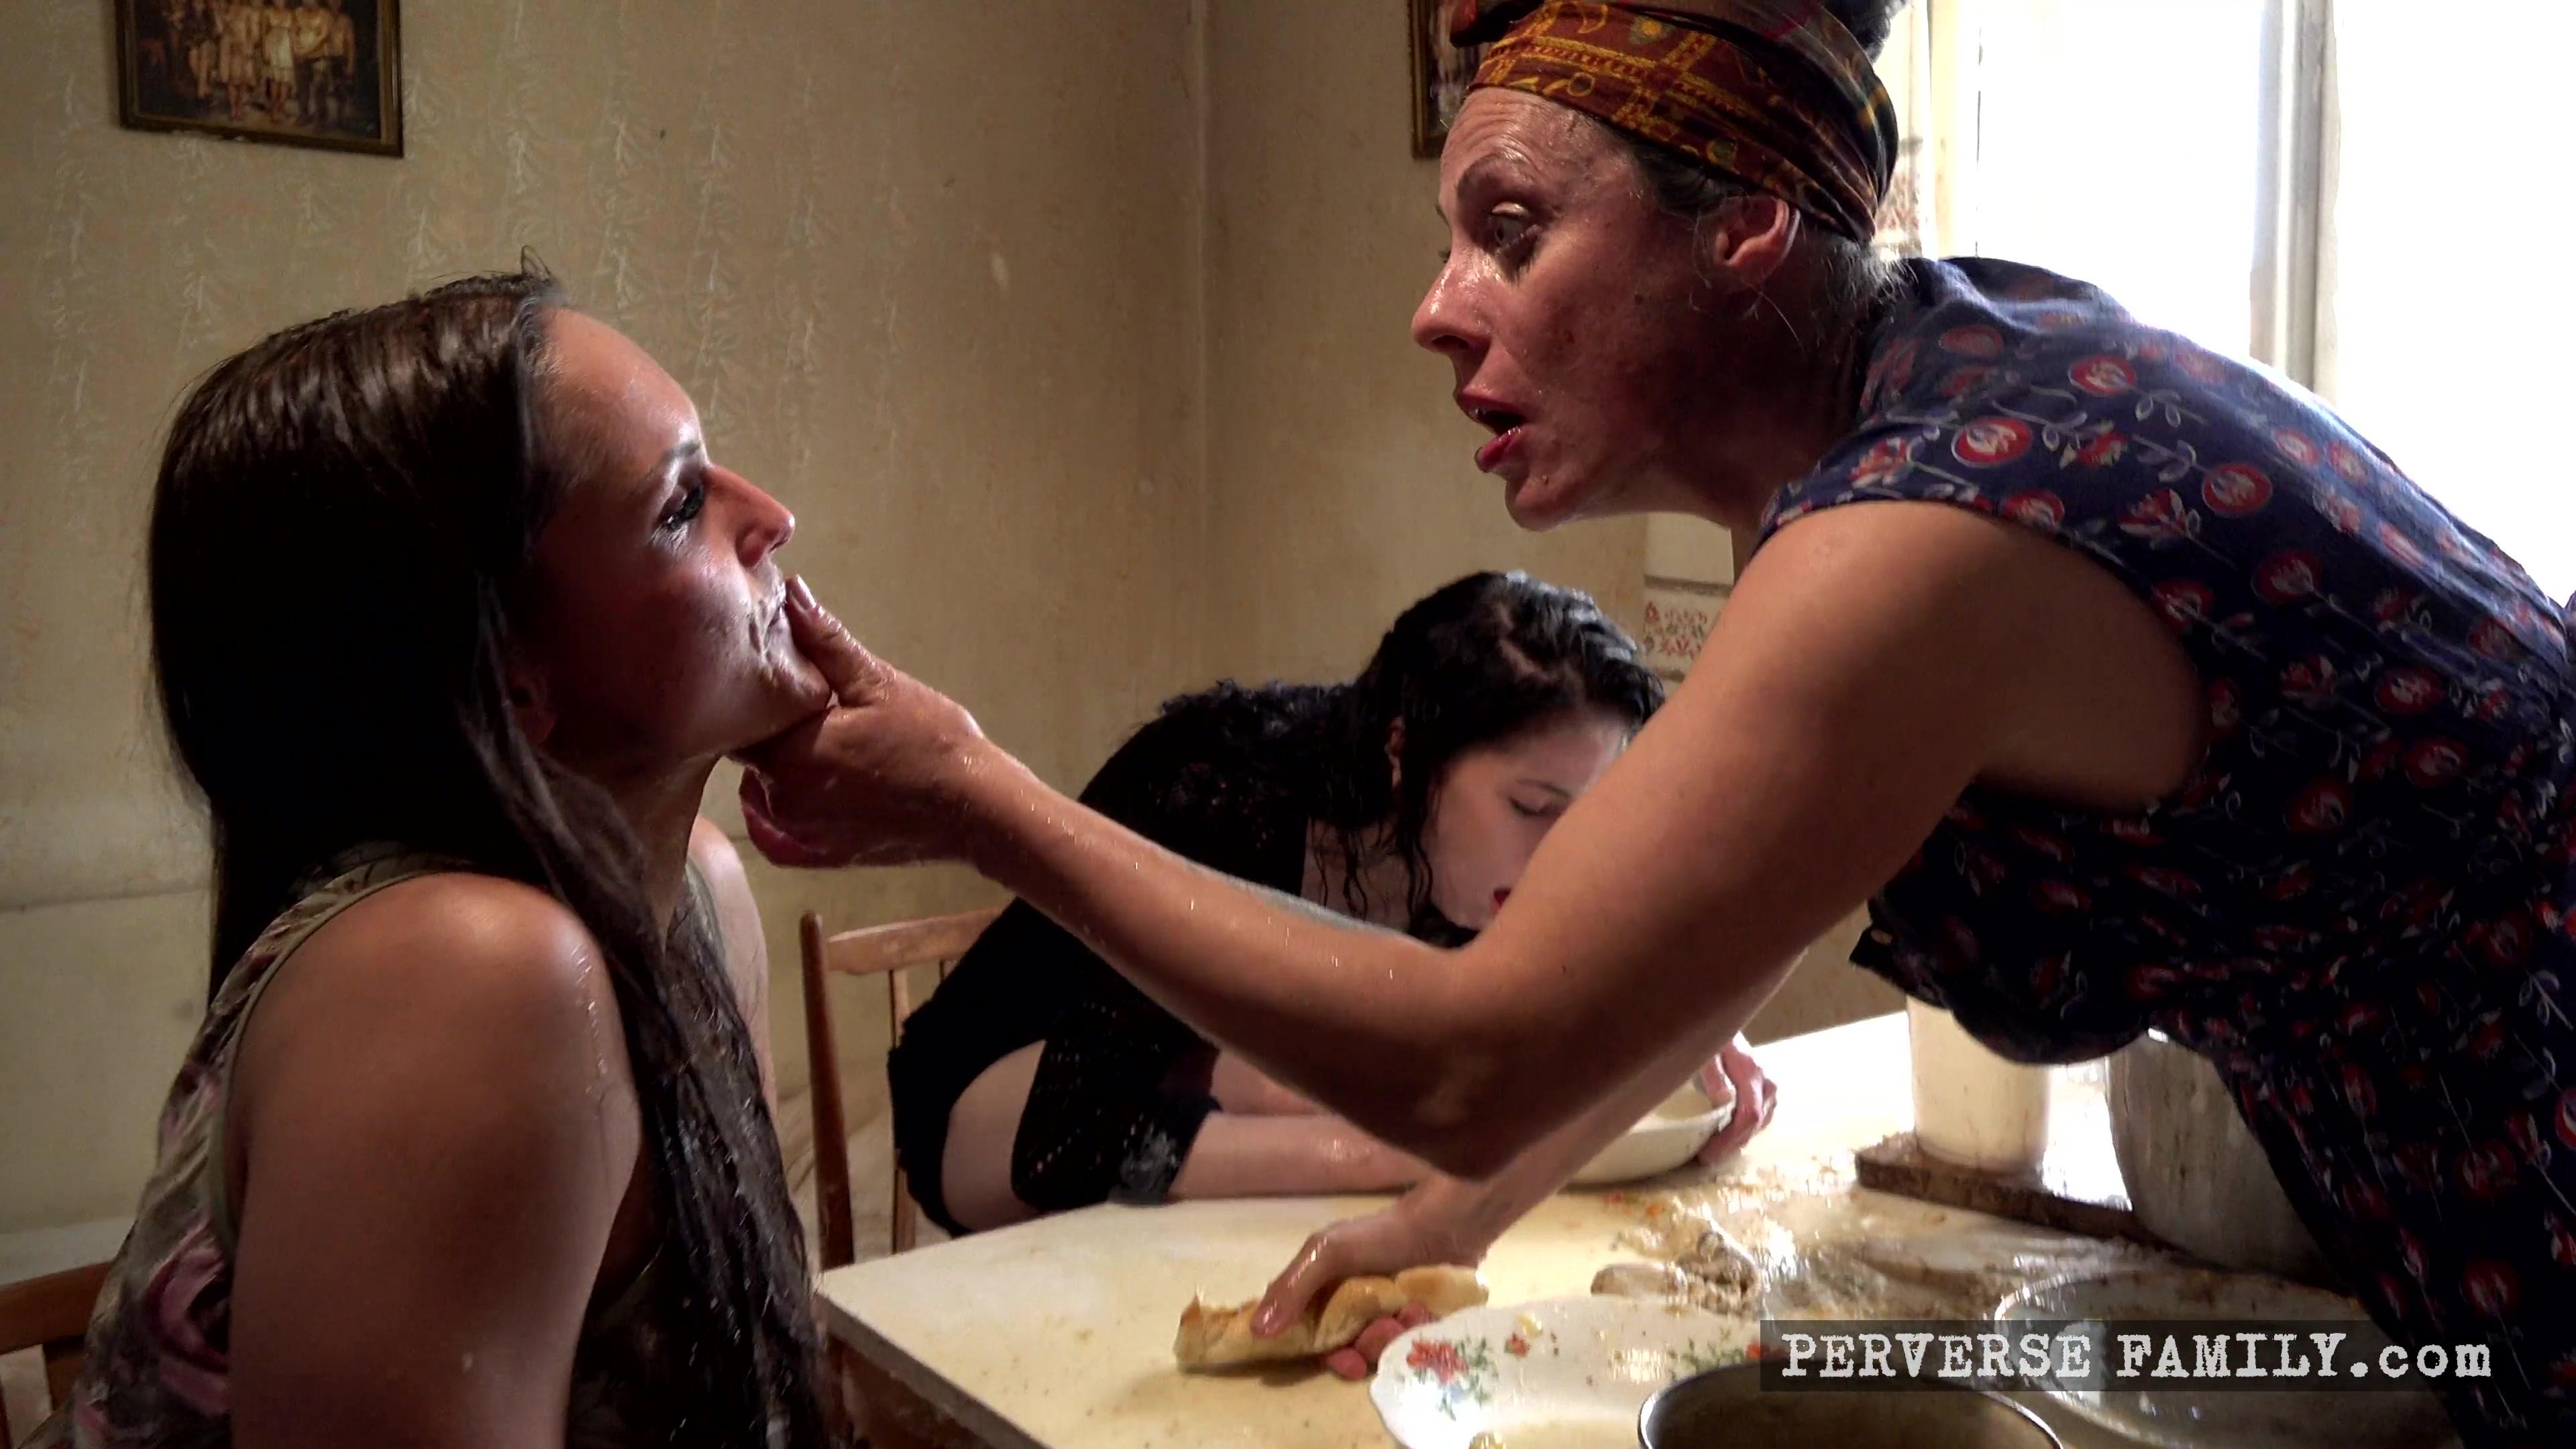 perverse-family-taste-my-vomit-3840x2160 00001